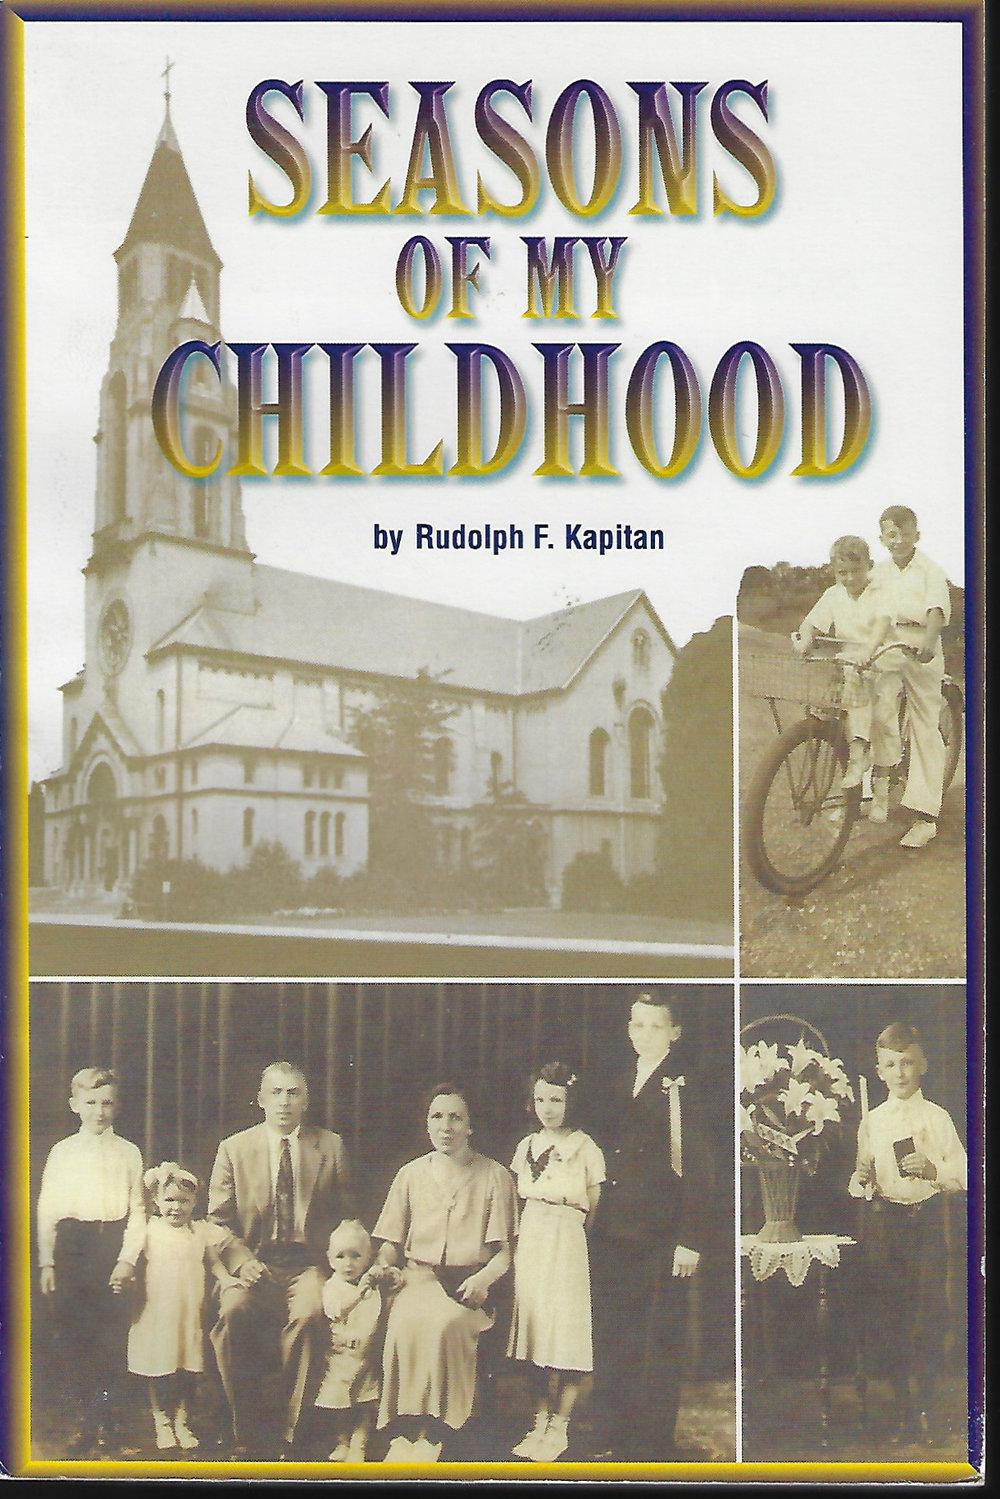 Seasons of My Childhood by Rudolph F. Kapitan, 2000